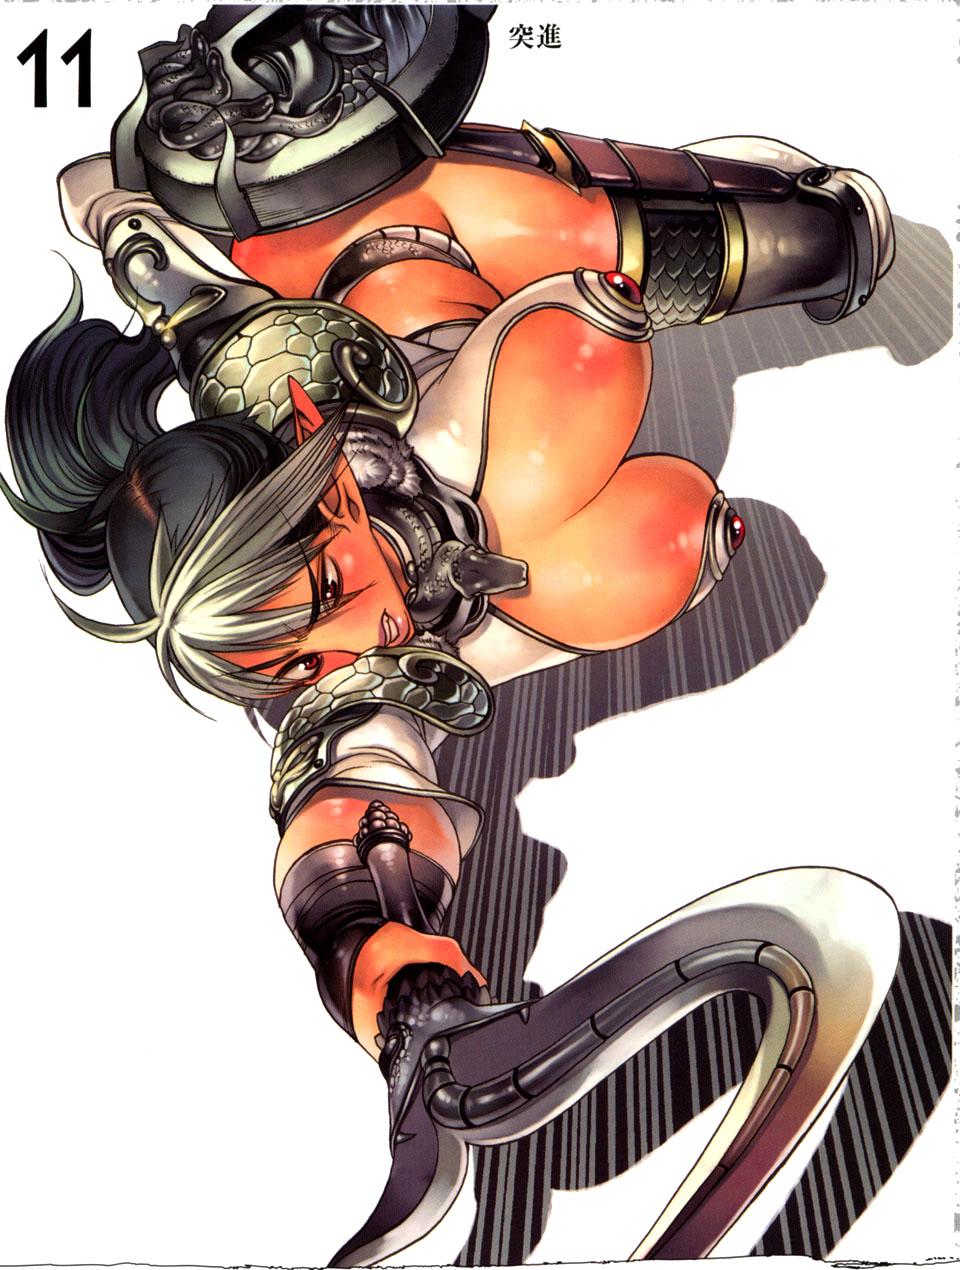 Image - Echidna 6.jpg   Queen's Blade Wiki   FANDOM ... Queens Blade Echidna Cosplay